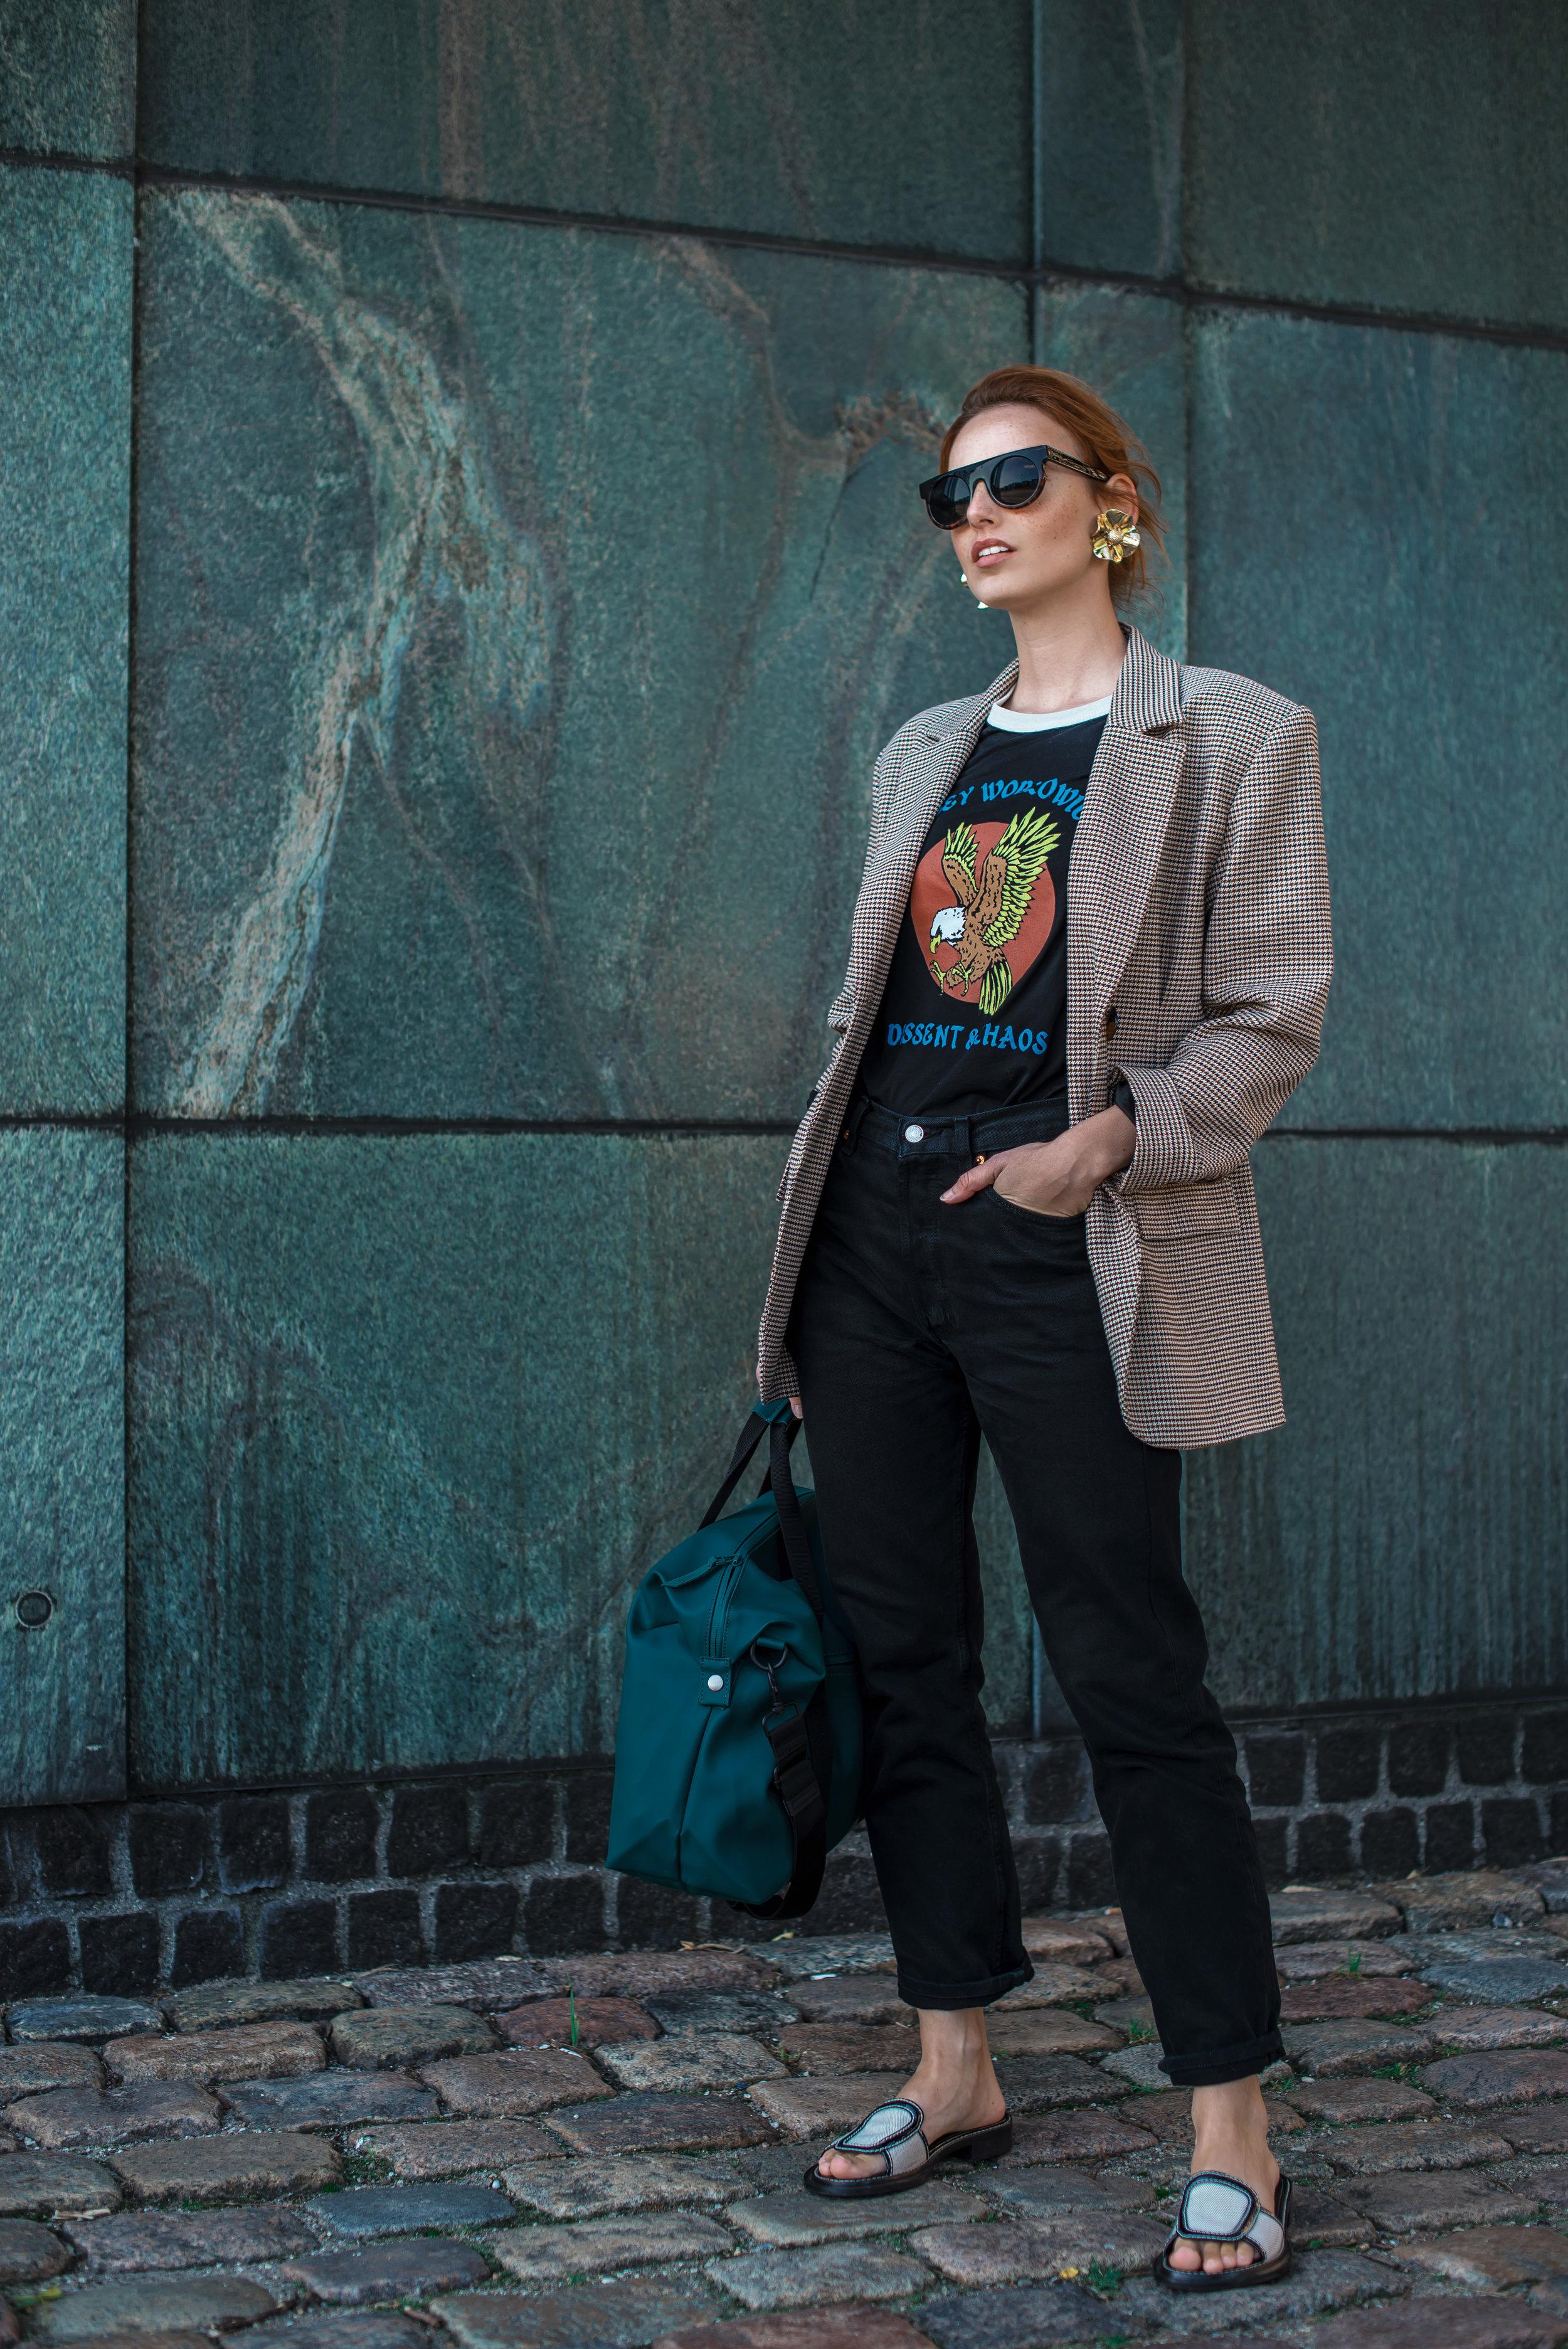 Zara blazer // Obey t-shirt // Levi's jeans // Acne Studios shoes // Rains bag // Komono sunnies